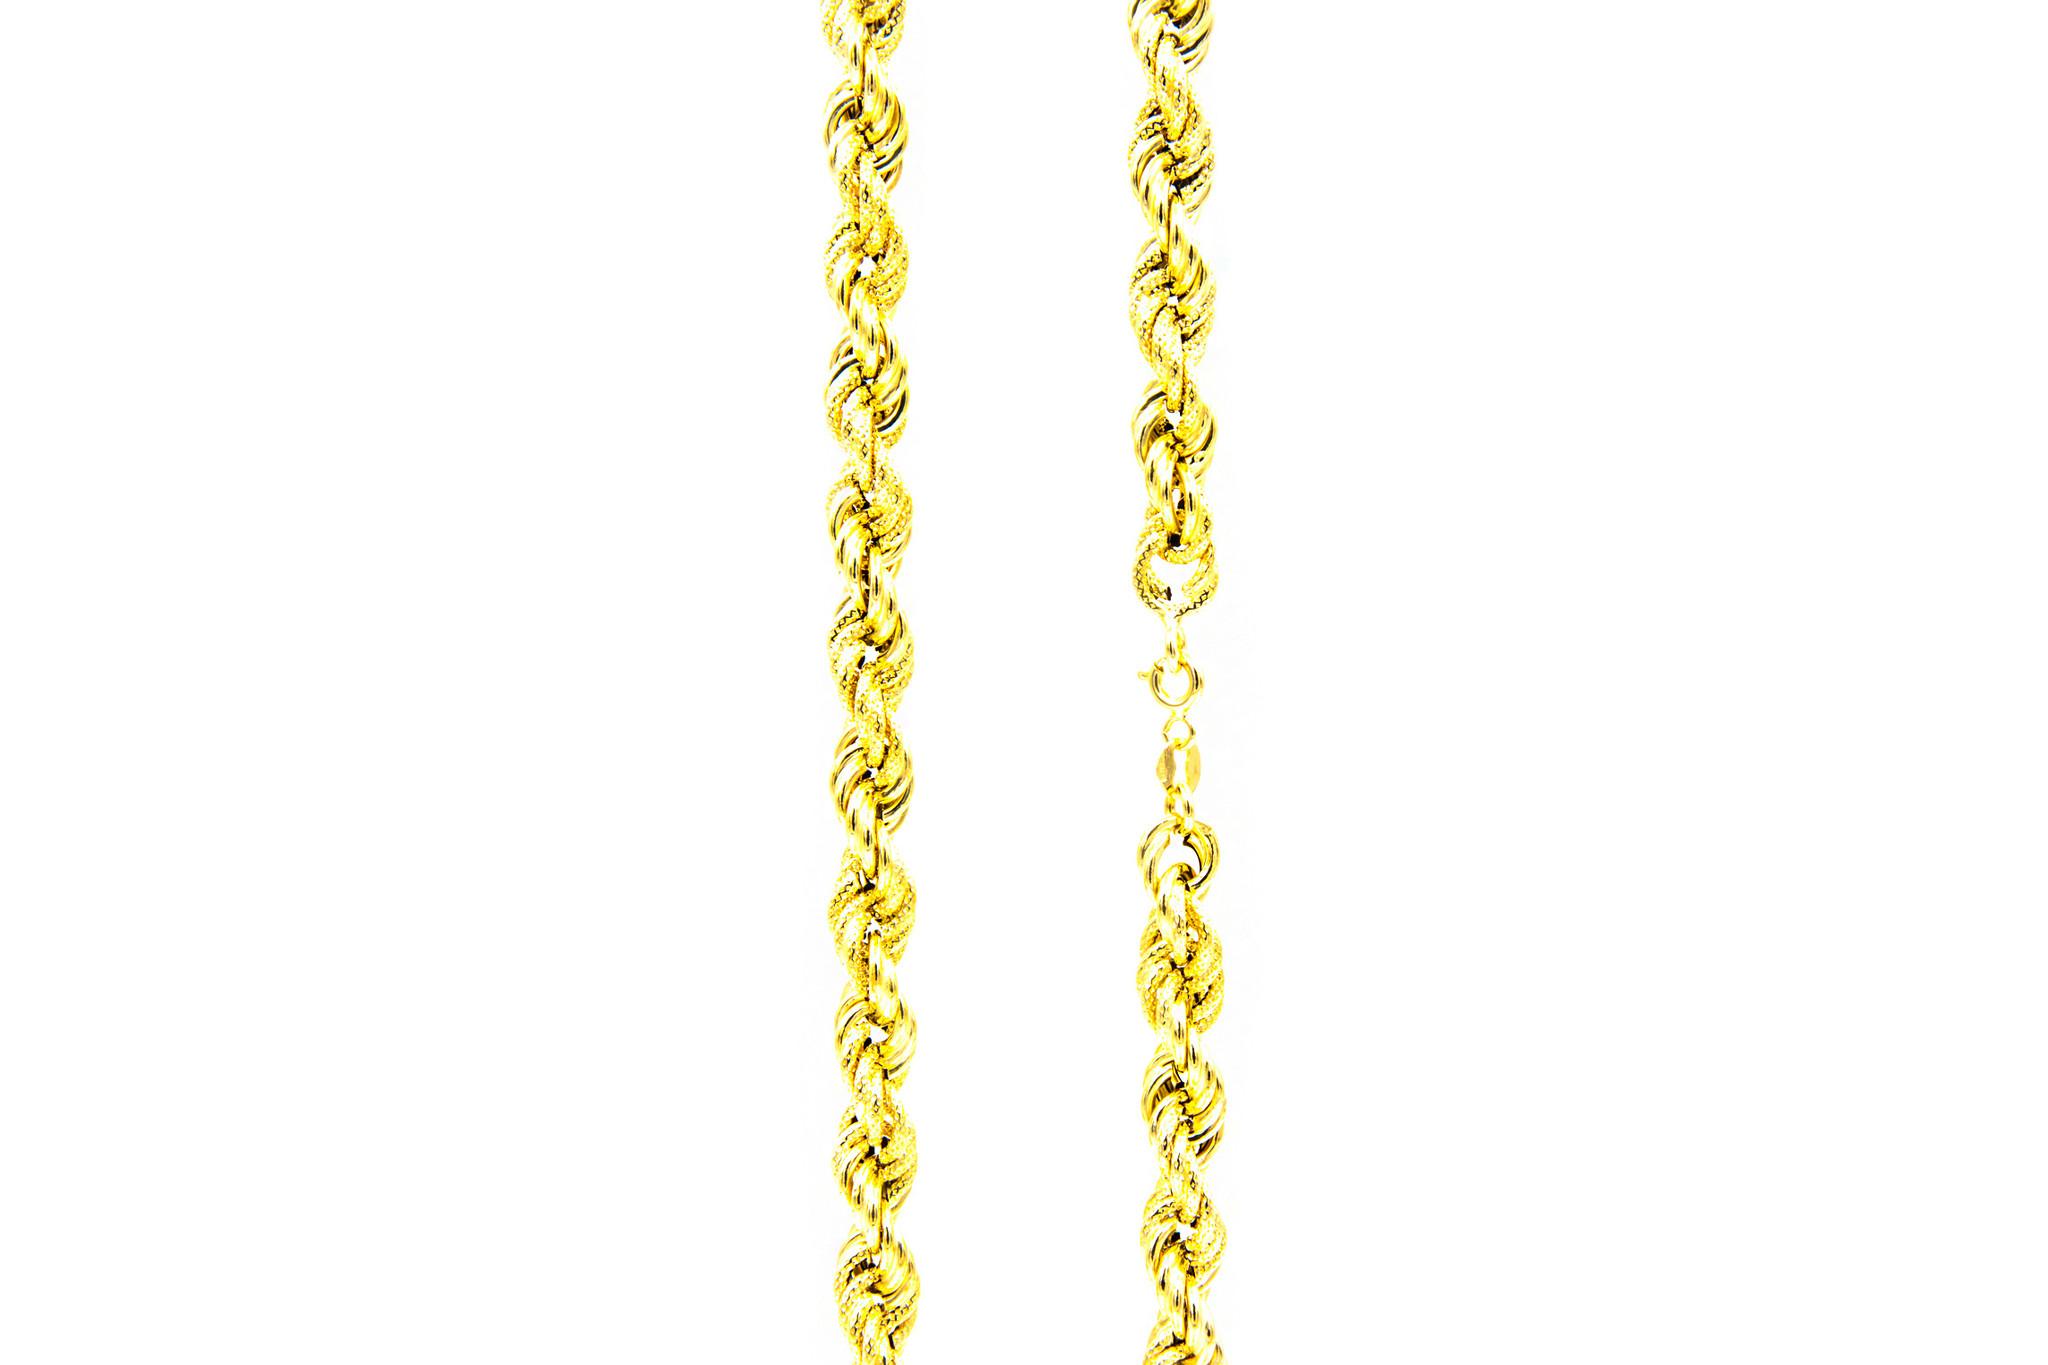 Ketting rope chain gedeeltelijk diamond cut-2